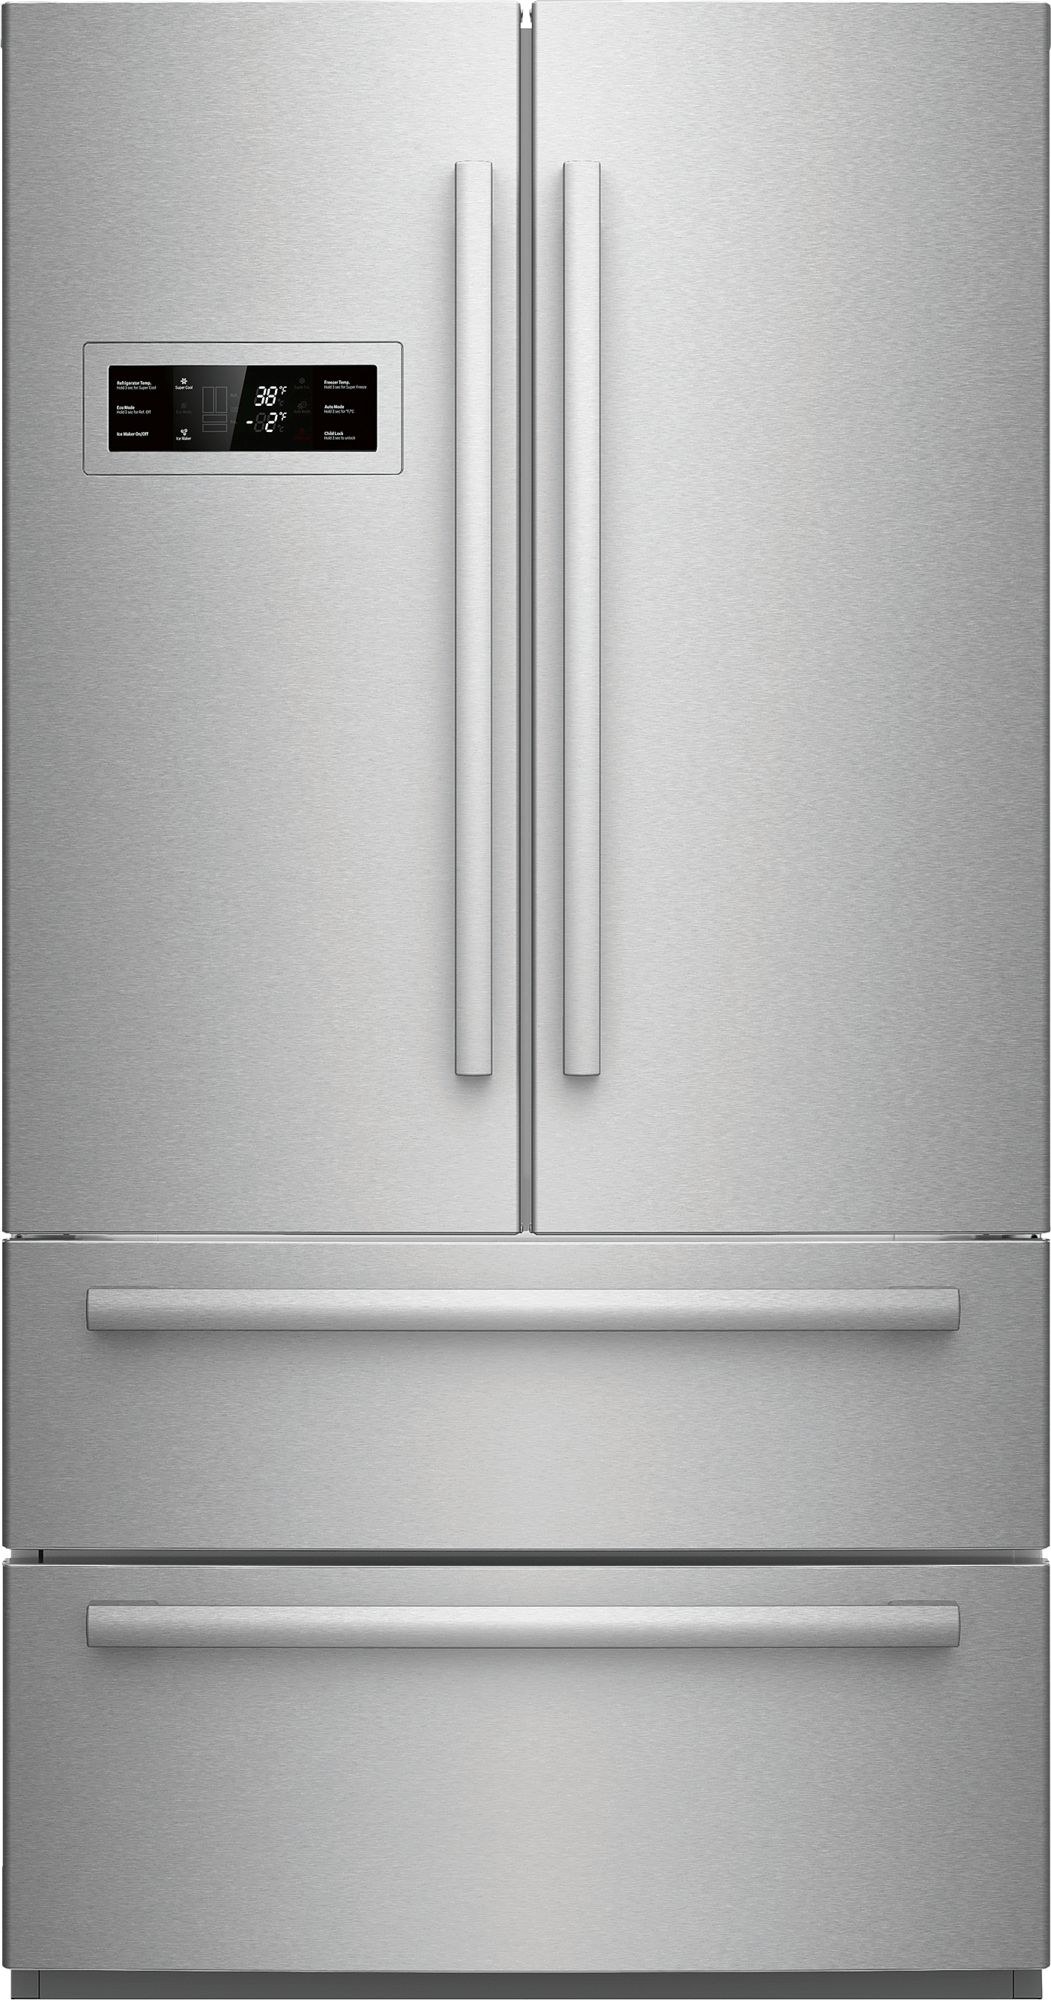 Counter Depth Refrigerator Appliances Hdtvs Mattresses Furniture